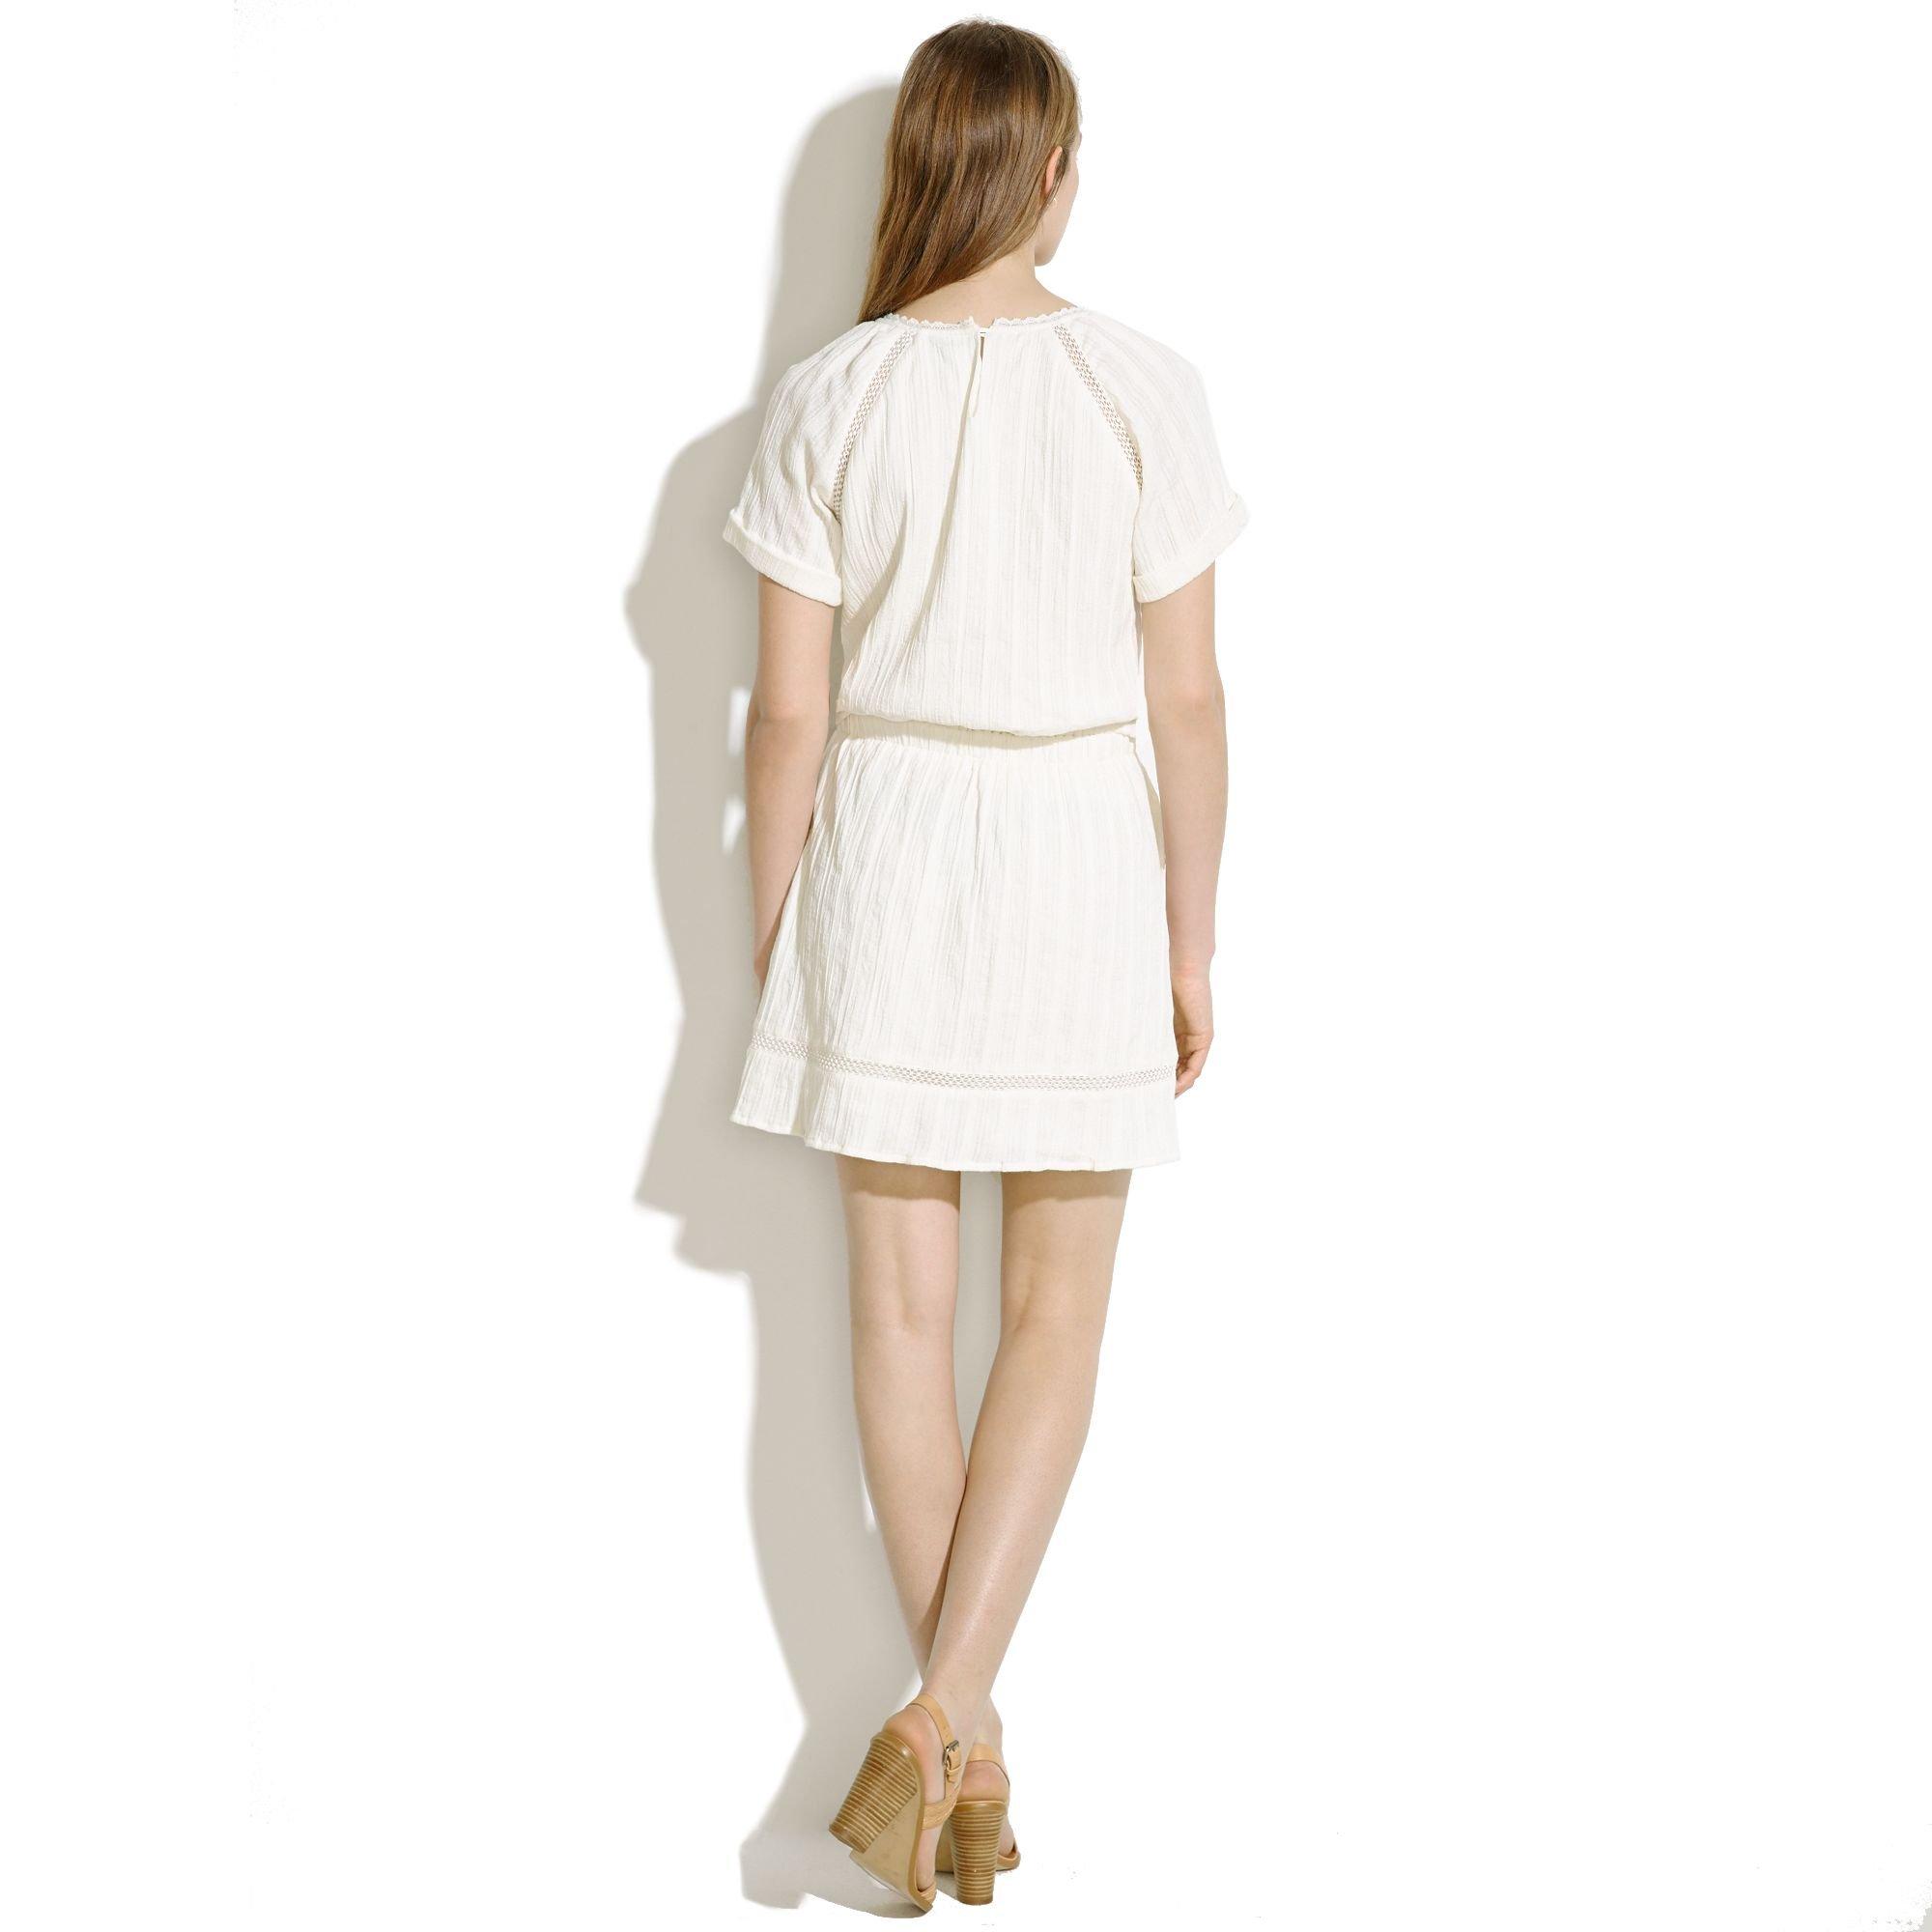 fb42b02089 Madewell Summerhouse Dress in White - Lyst